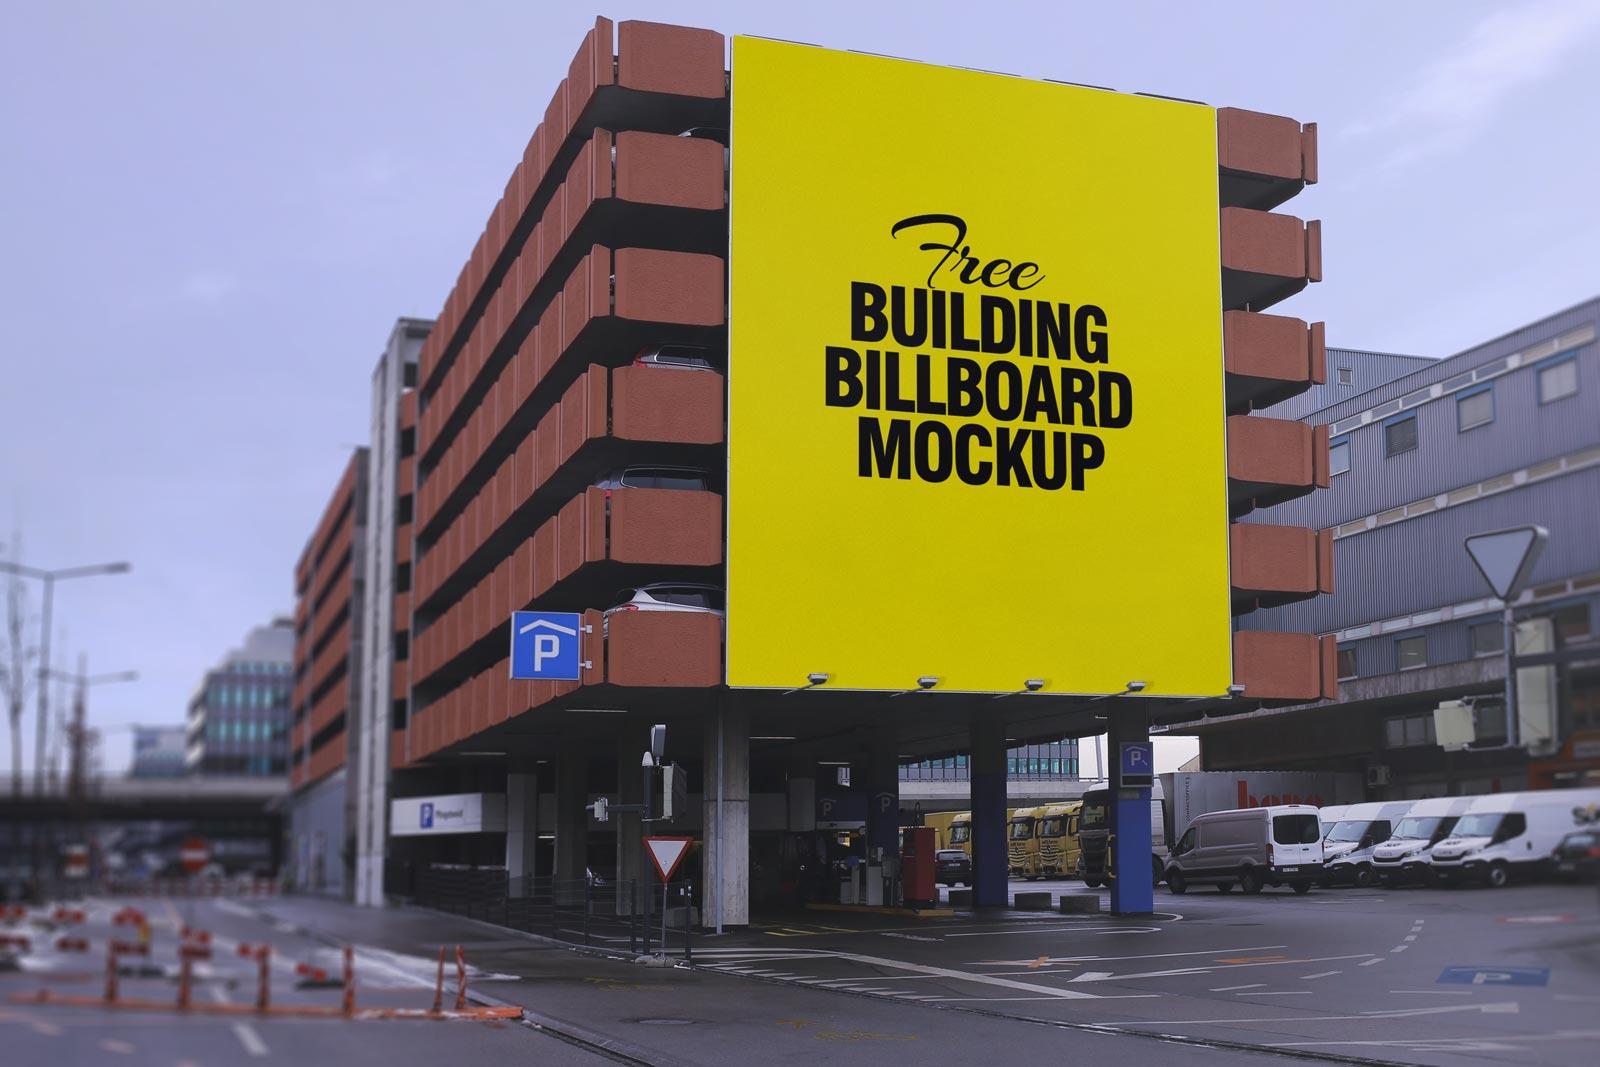 Free Outdoor Building Billboard Mockup PSD (1)